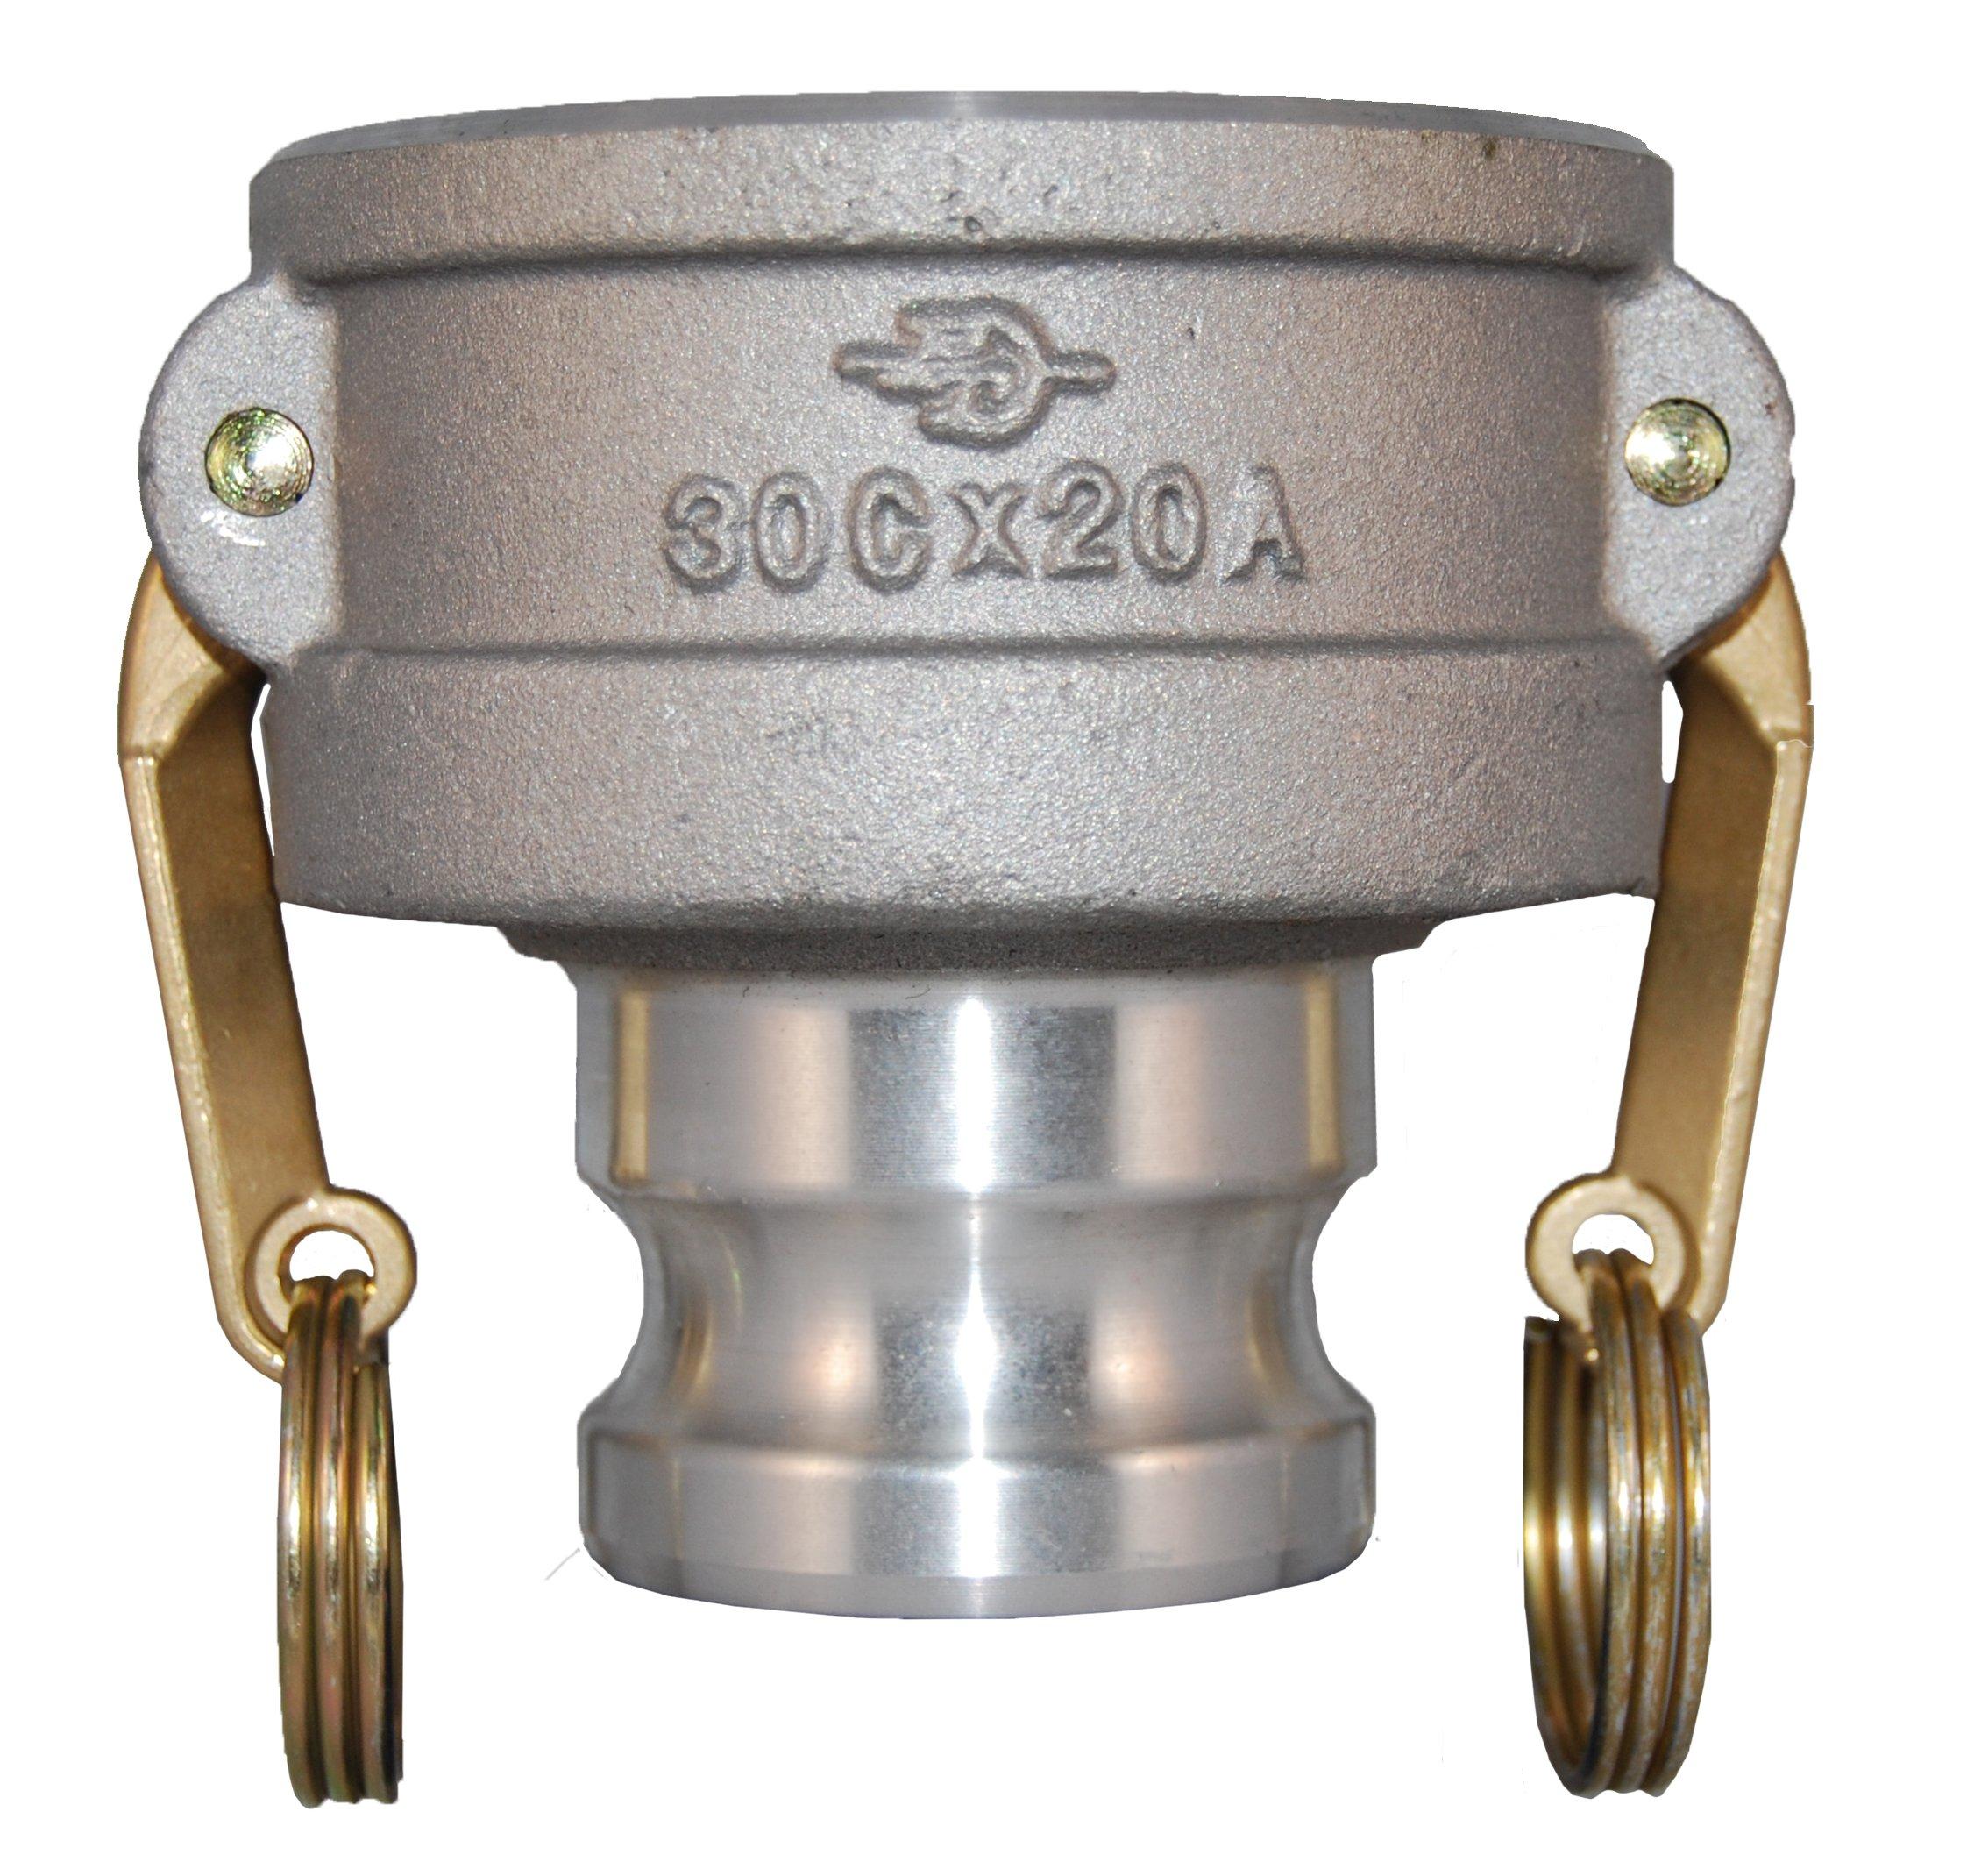 PT Coupling 6026604060CX40A Aluminum Reducer Cam and Groove Hose Fitting, CXA Short Reducer, Brass (HB) Cam Arms, 6'' Coupler x 4'' Adapter